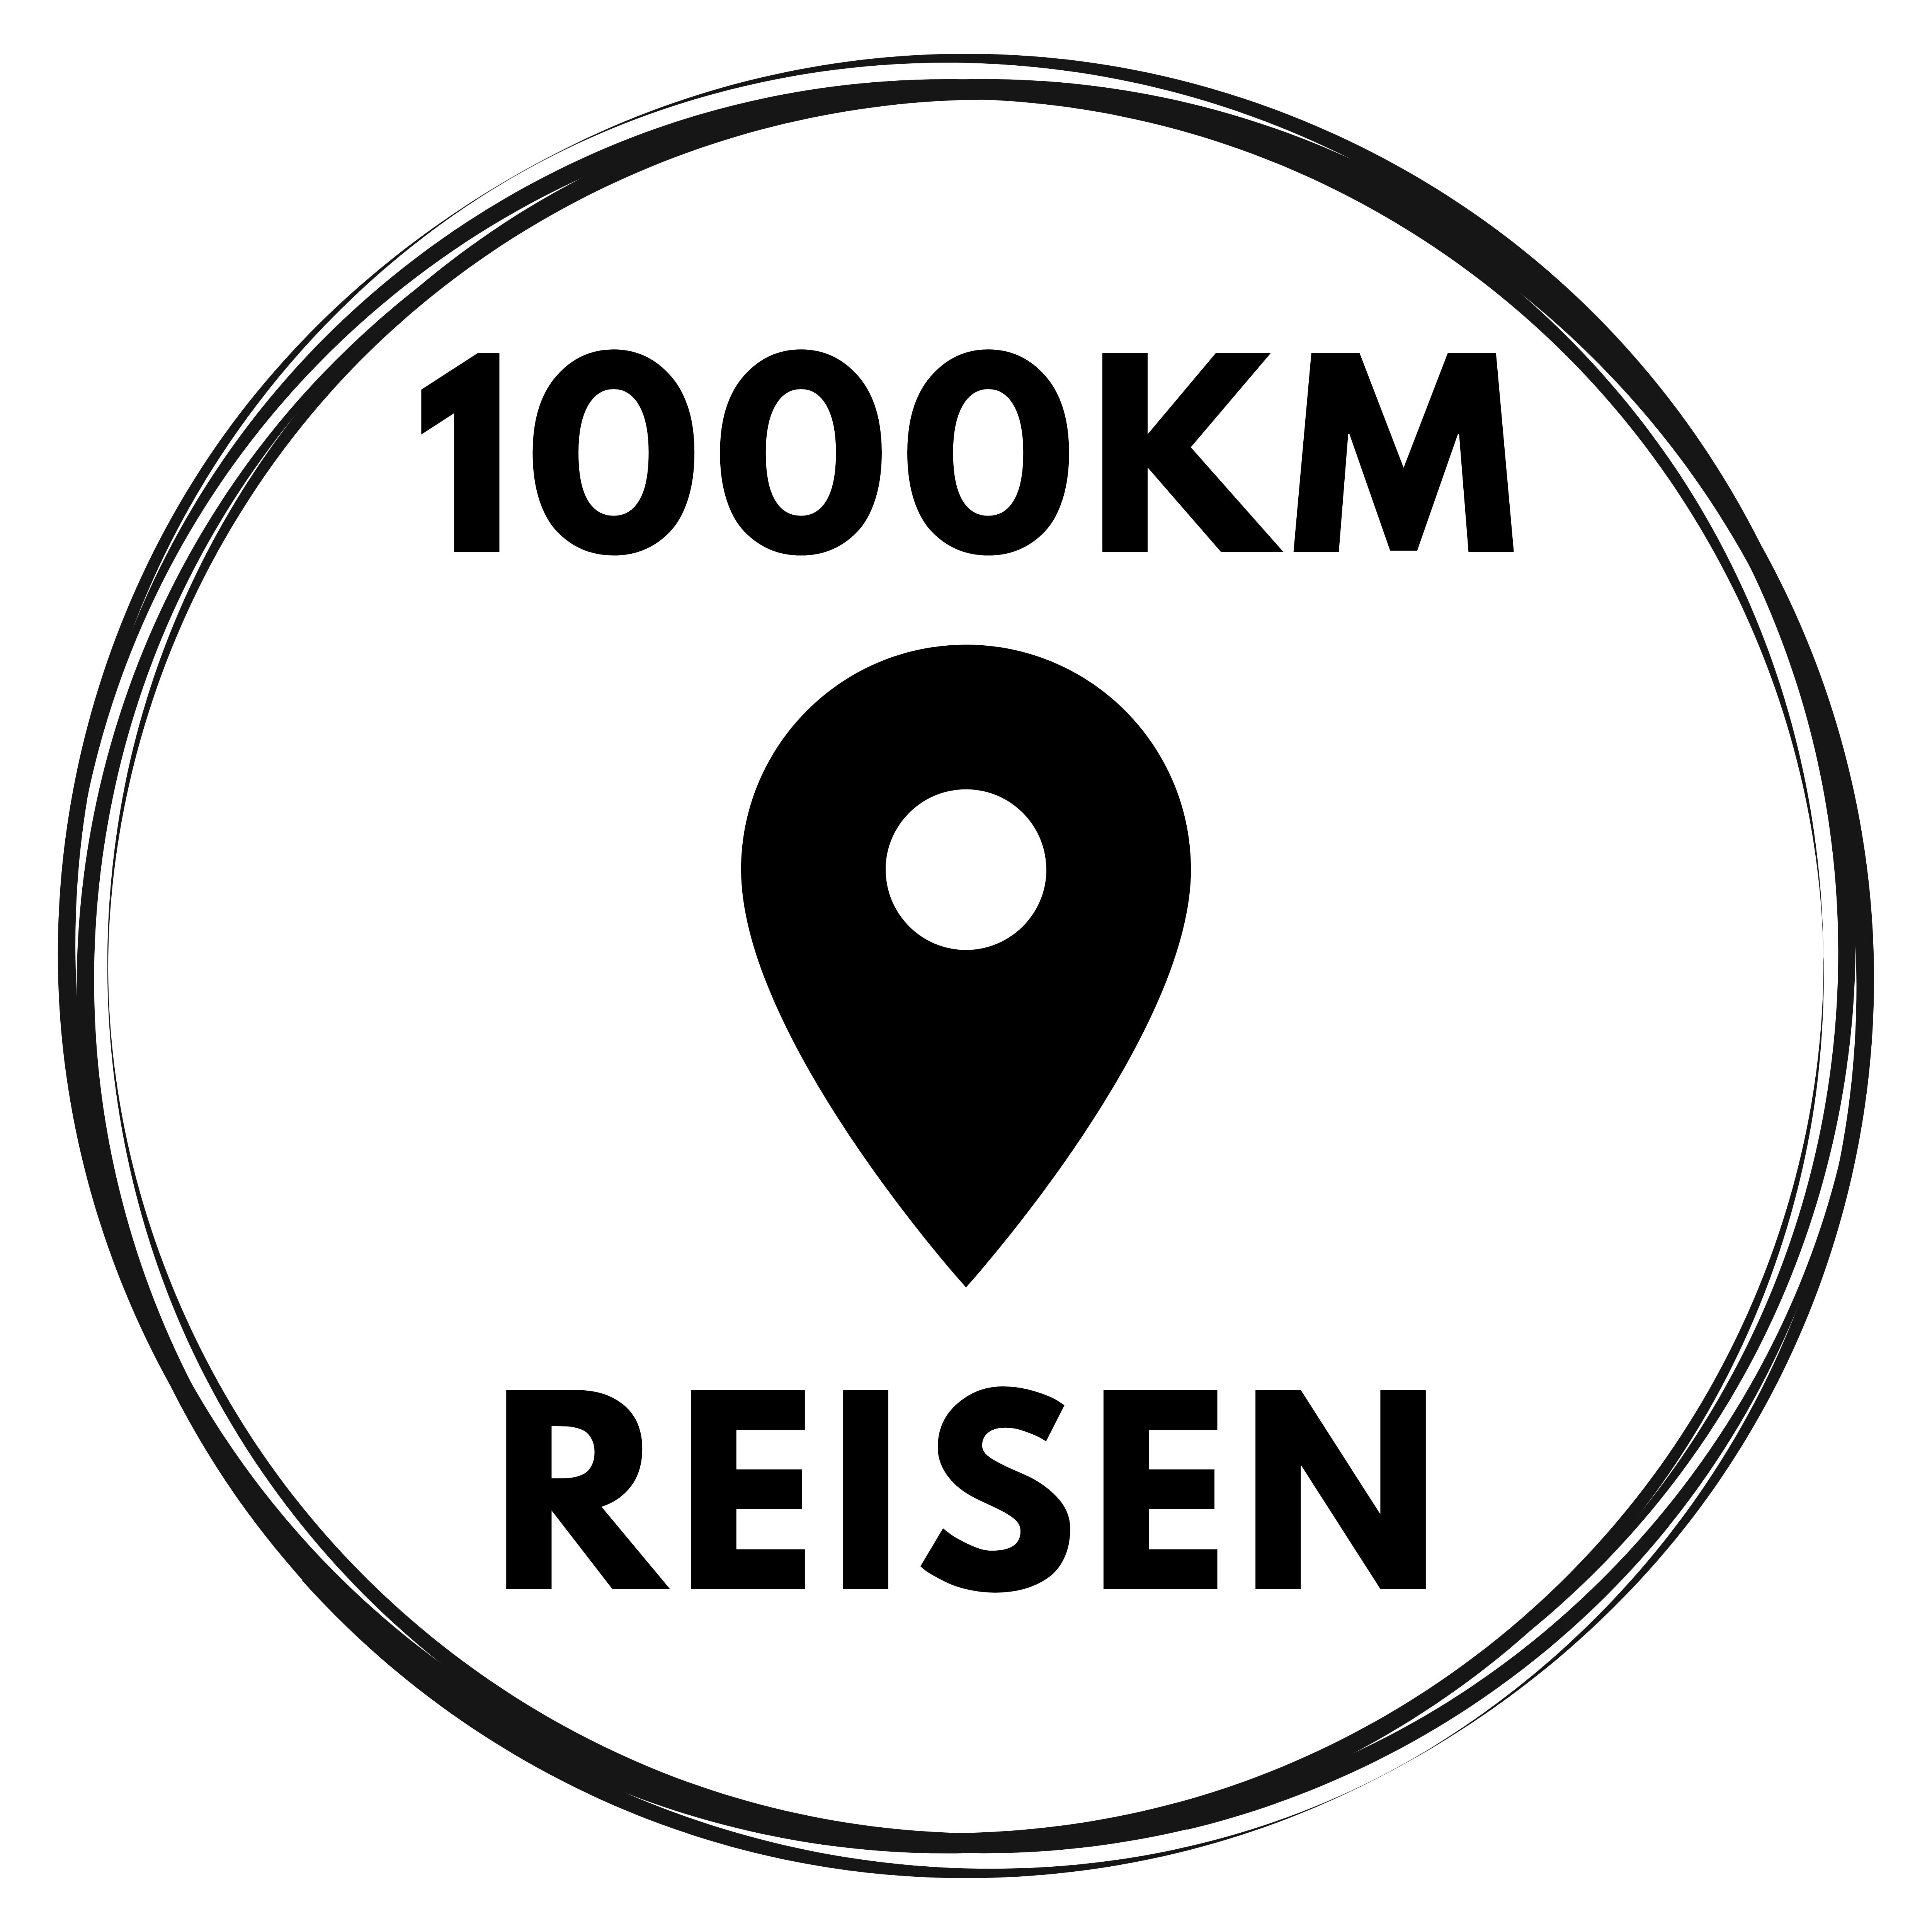 1000KM Reisen